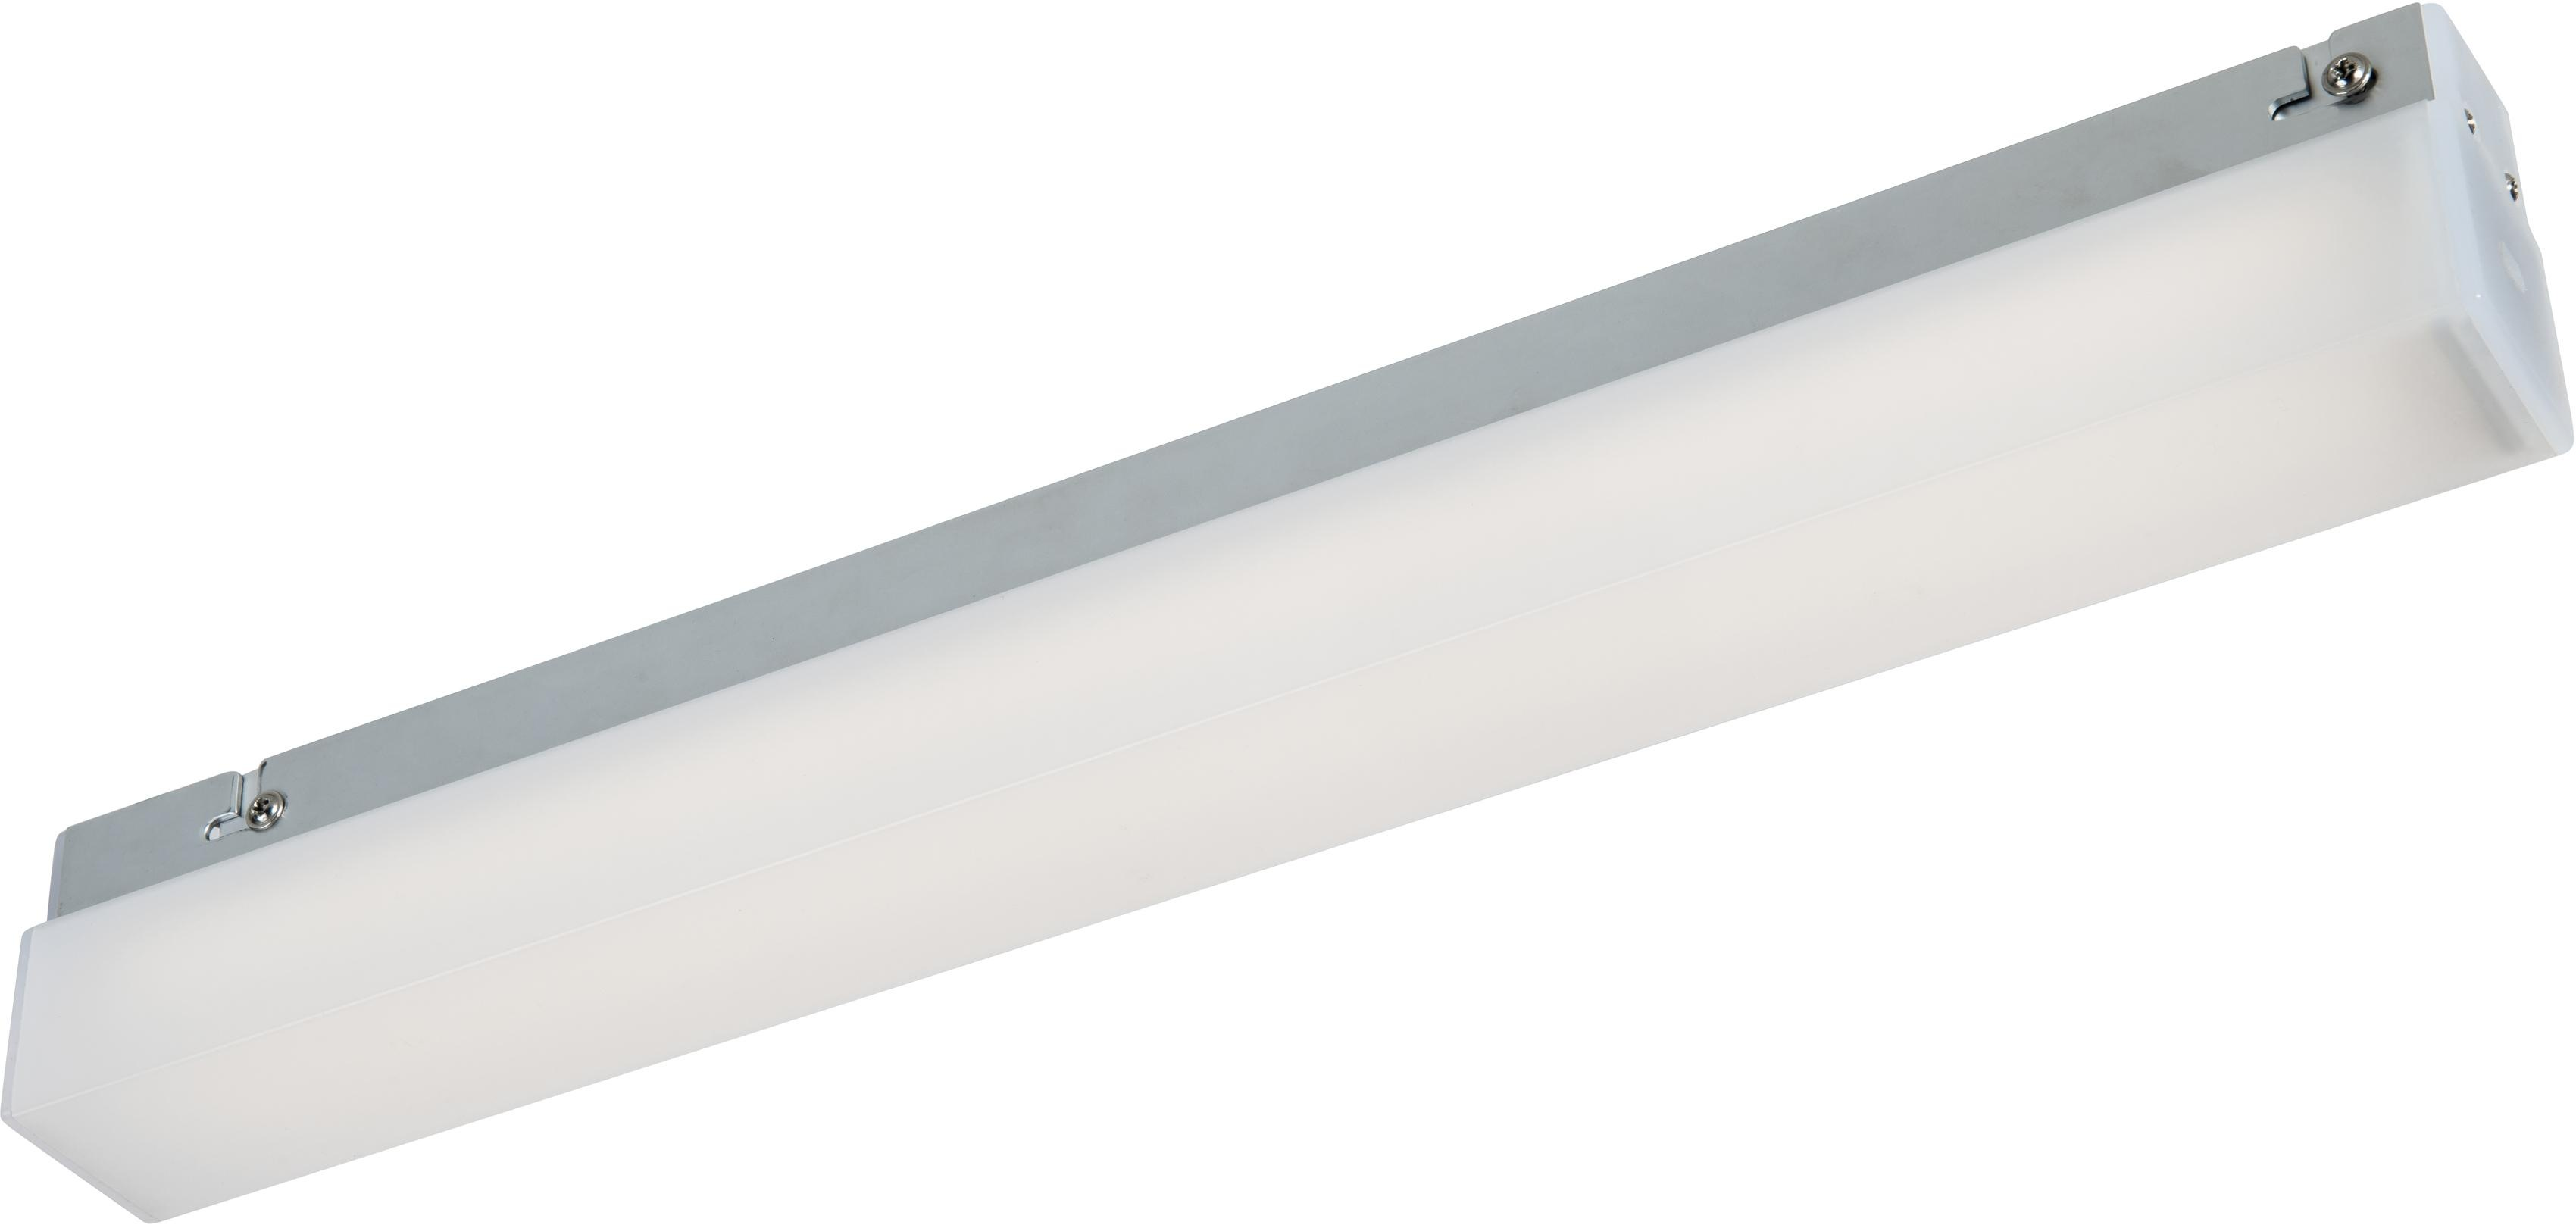 Nino Leuchten LED Wandleuchte SPARKY, LED-Board, Warmweiß